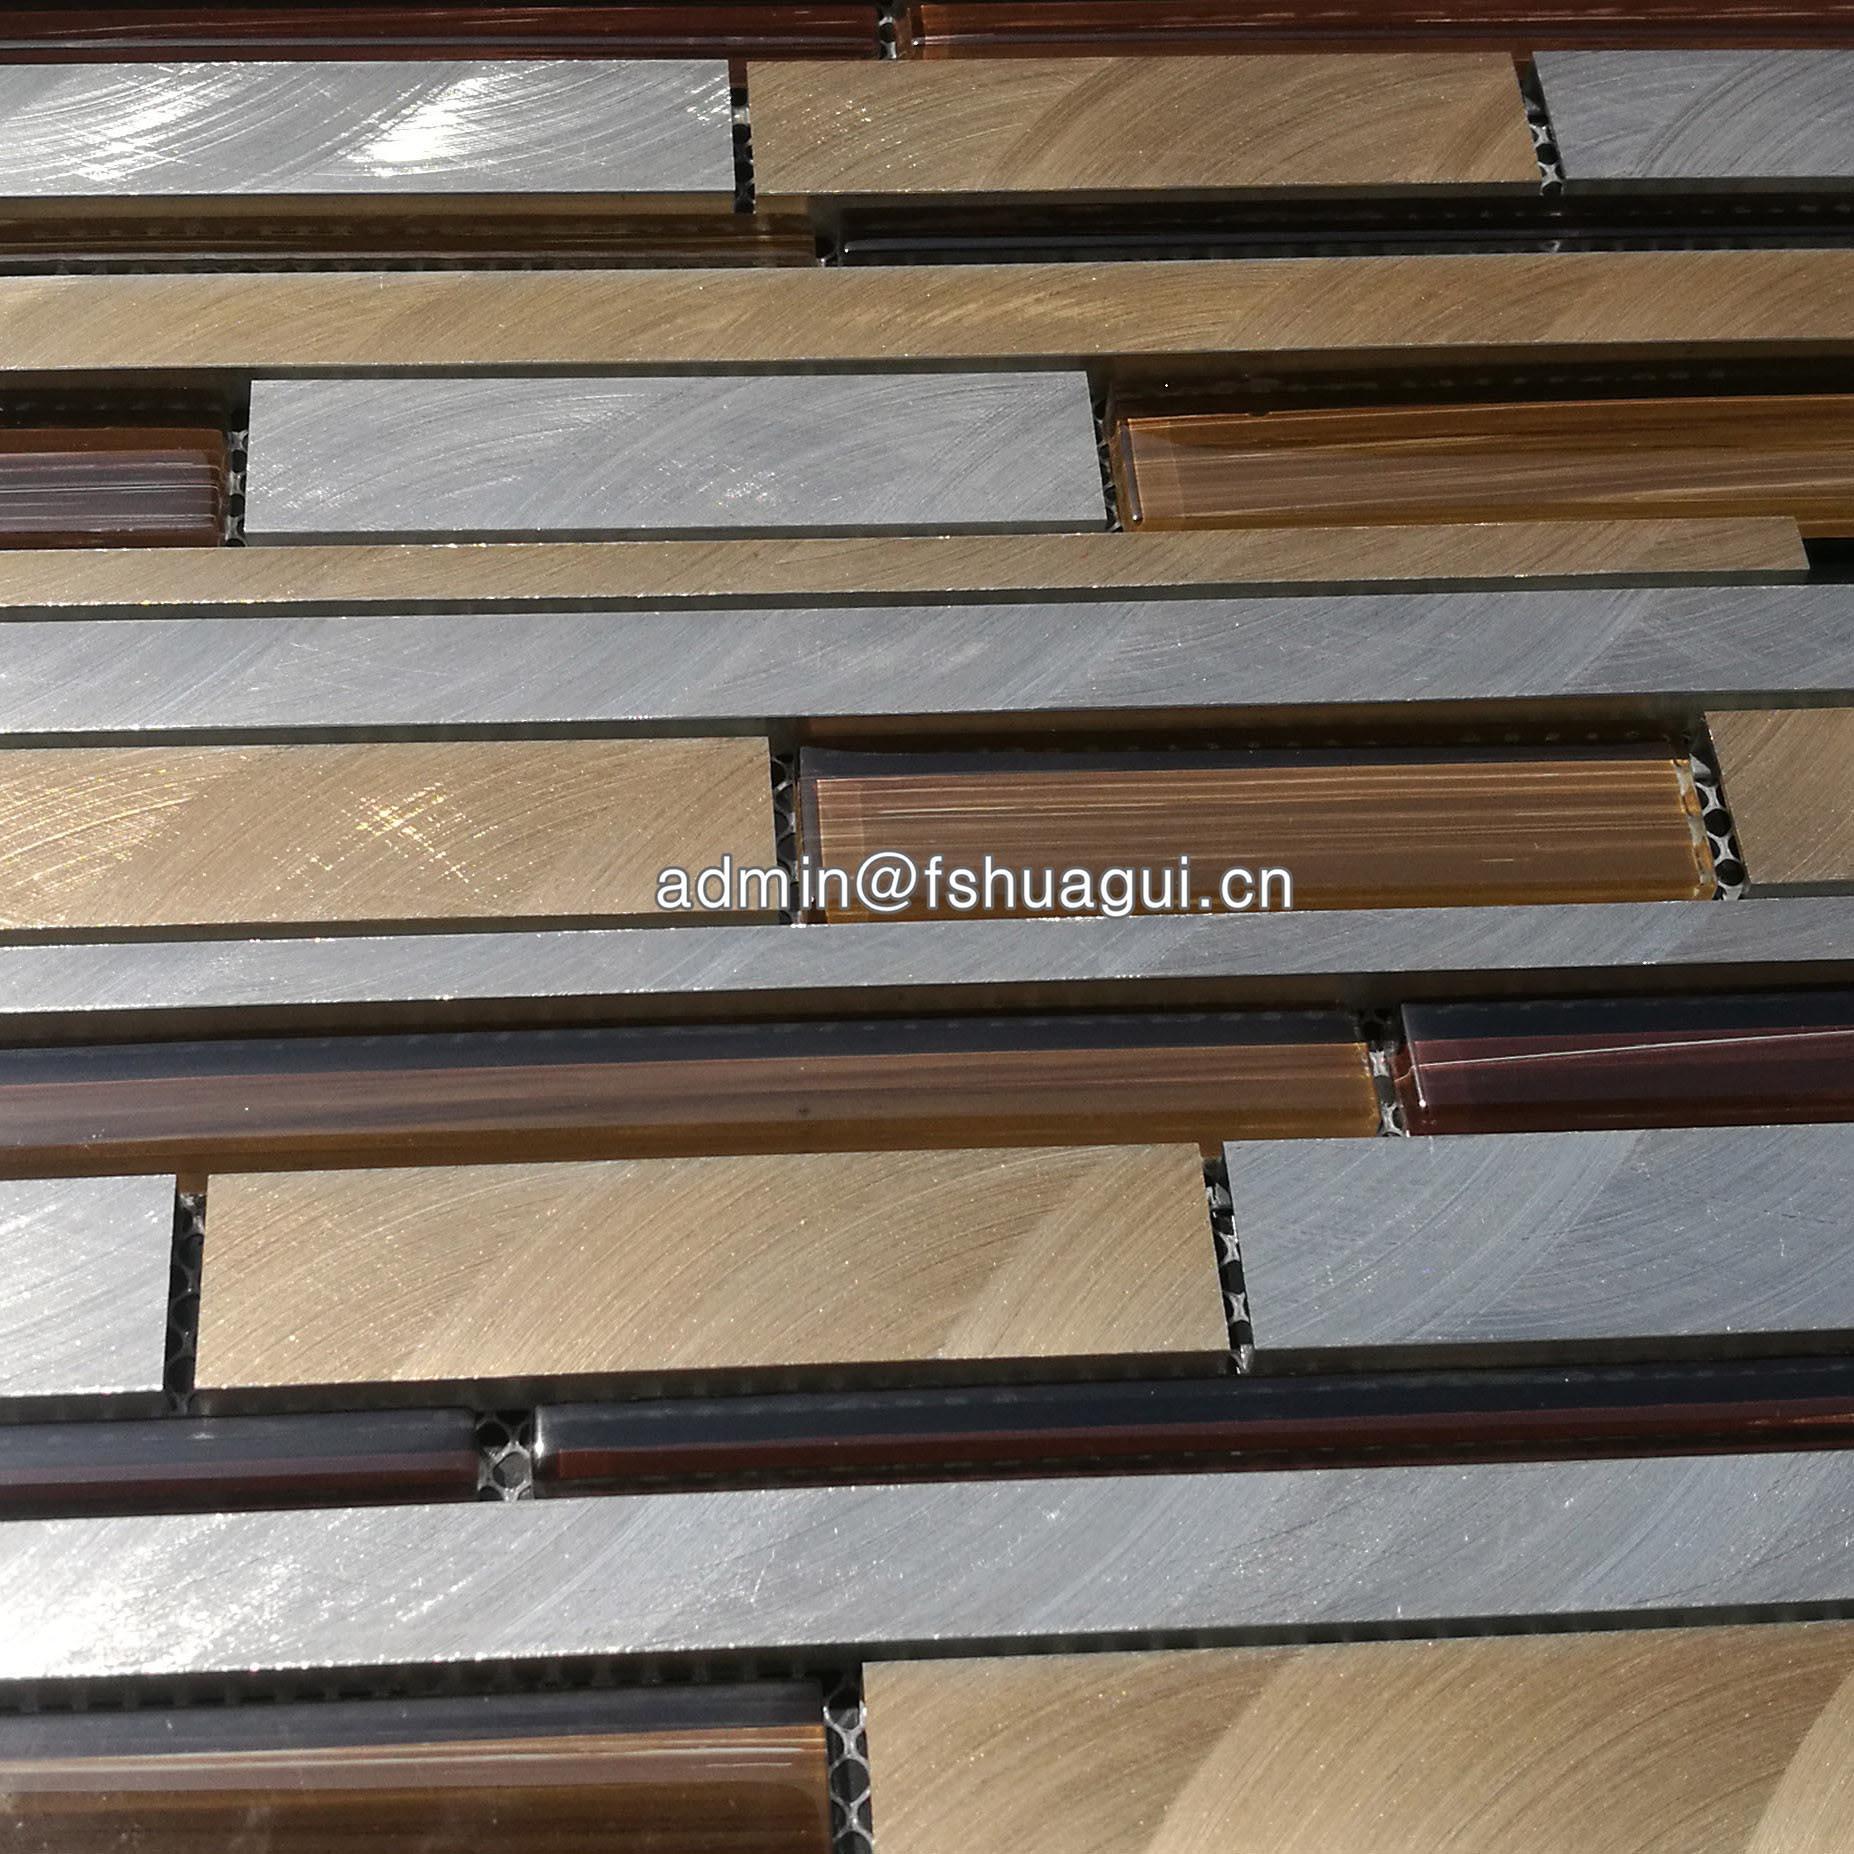 Brushed stellar golden silver aluminum metal mosaic tiles UK